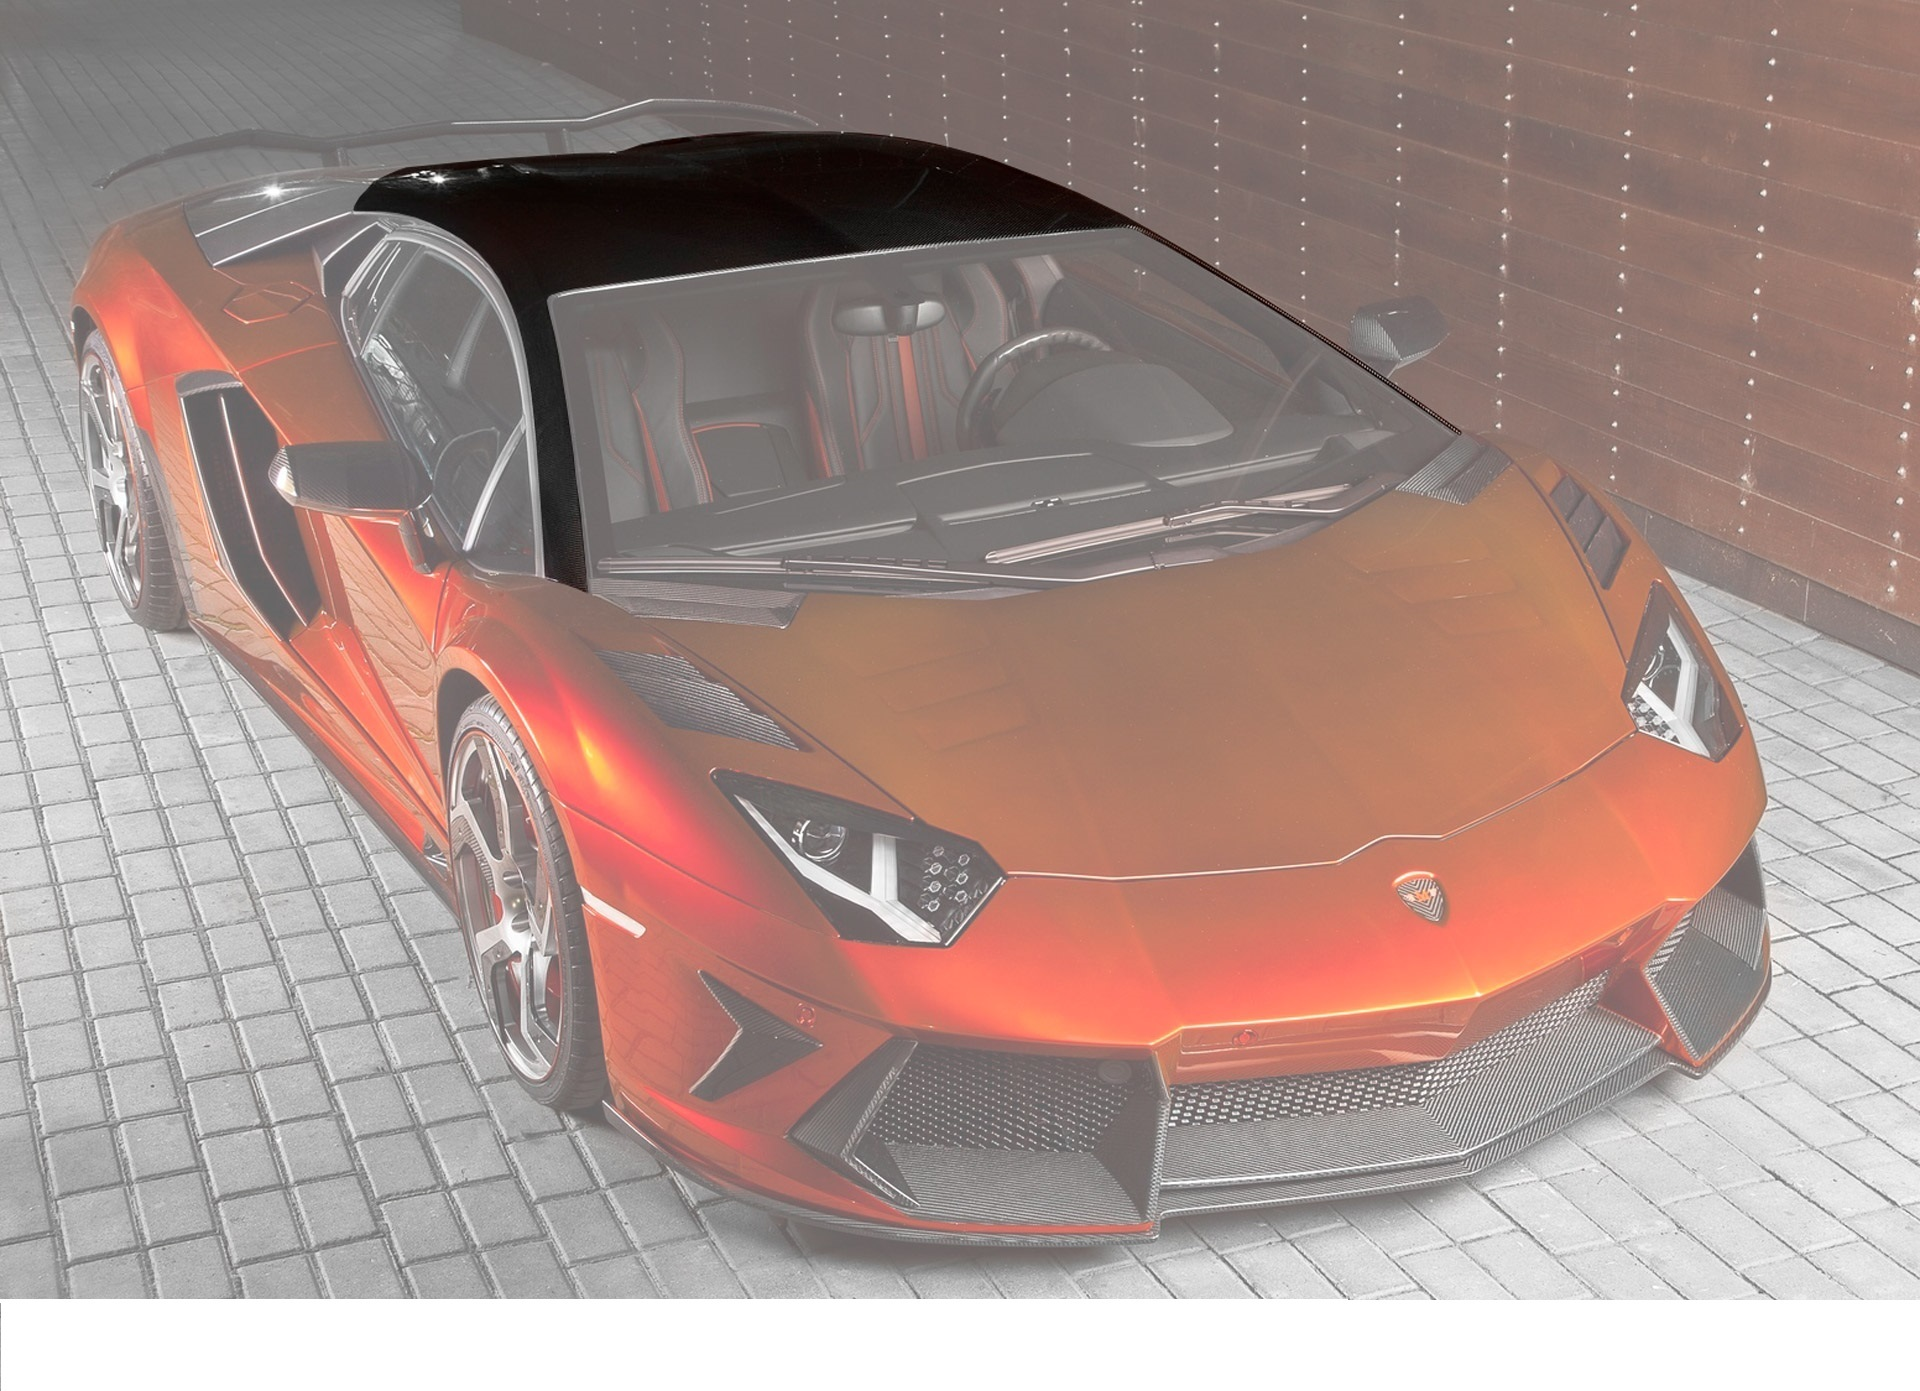 Карбоновая крыша Mansory Style 2 для Lamborghini Aventador